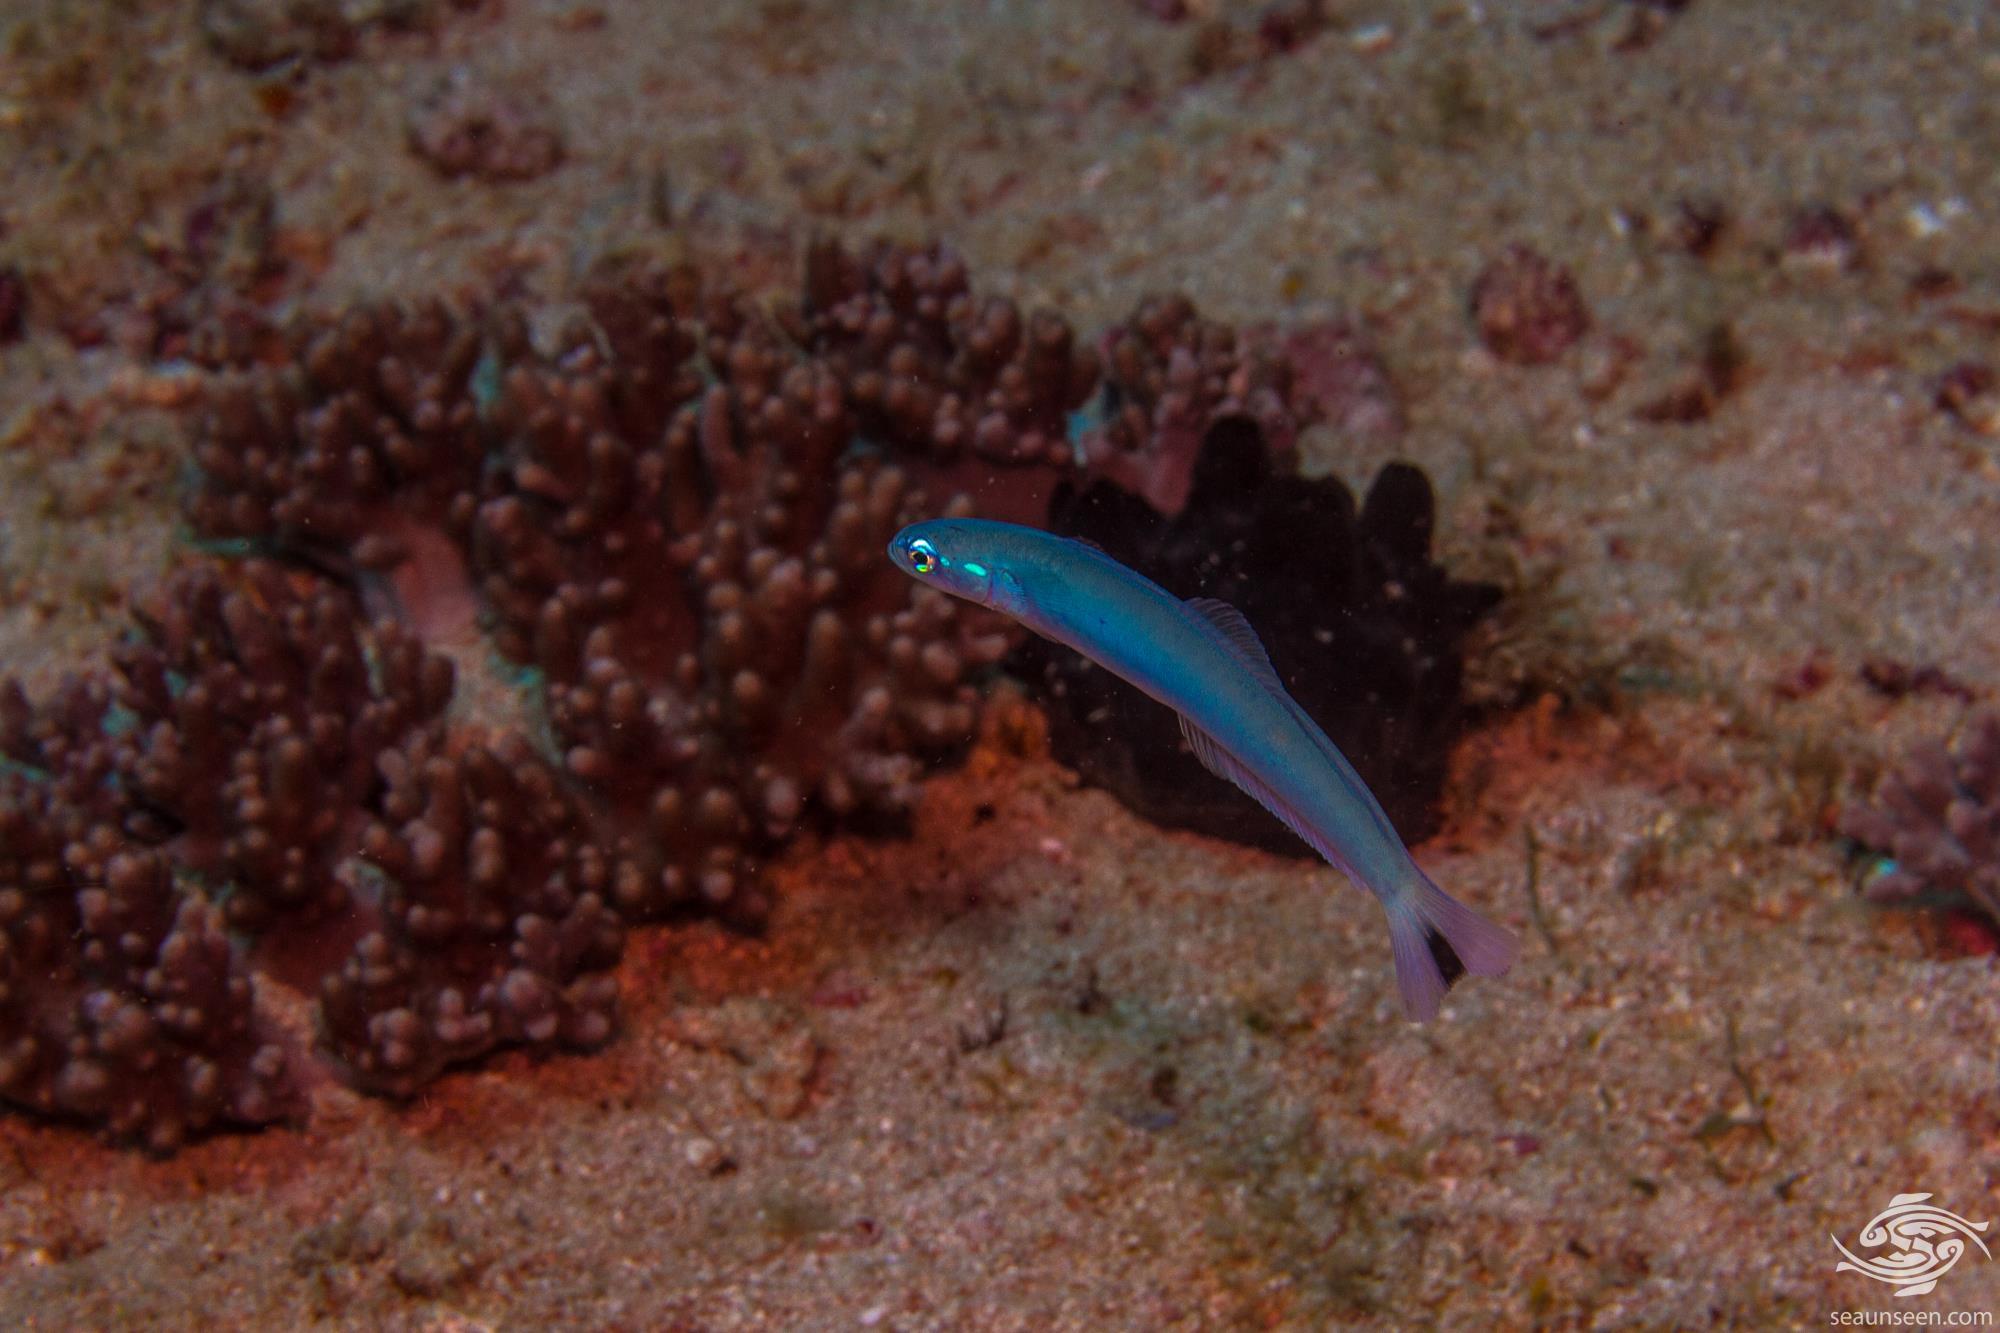 Spot Tail Dartfish, Ptereleotris heteroptera, is also known as the Blacktail Dartfish, Indigo Dartfish and Blacktail Goby.